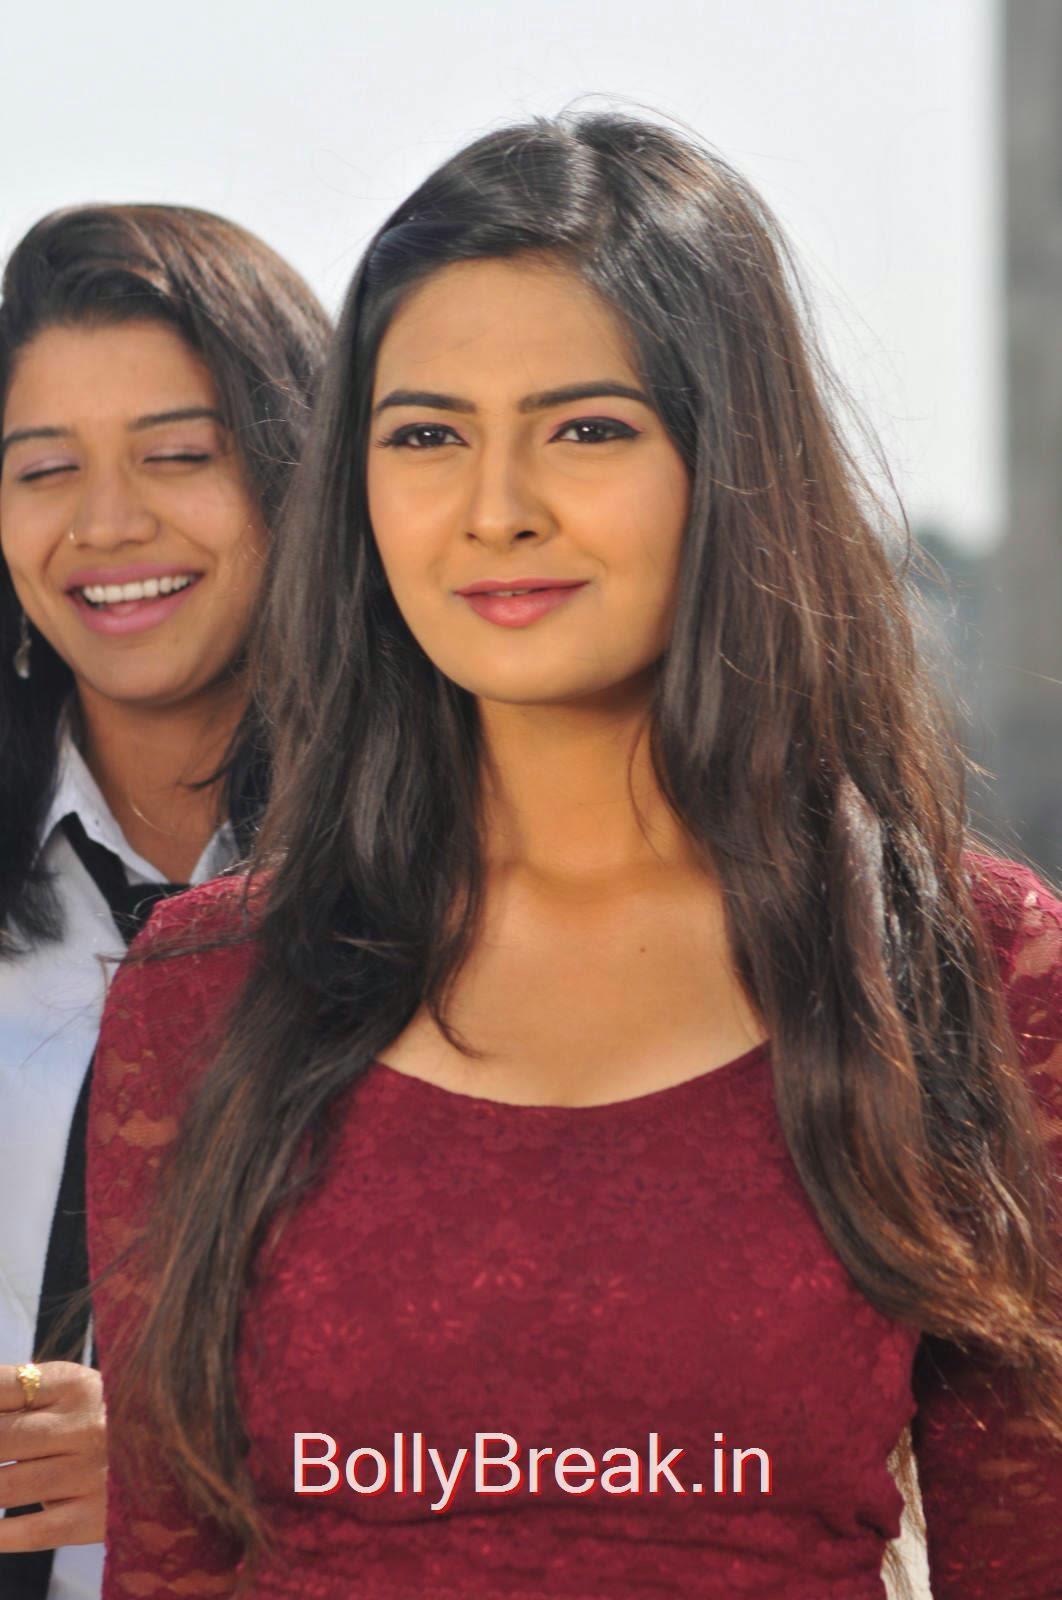 Neha Deshpande Photo Gallery, Actress Neha Deshpande Hot HD Stills from The Bells Movie